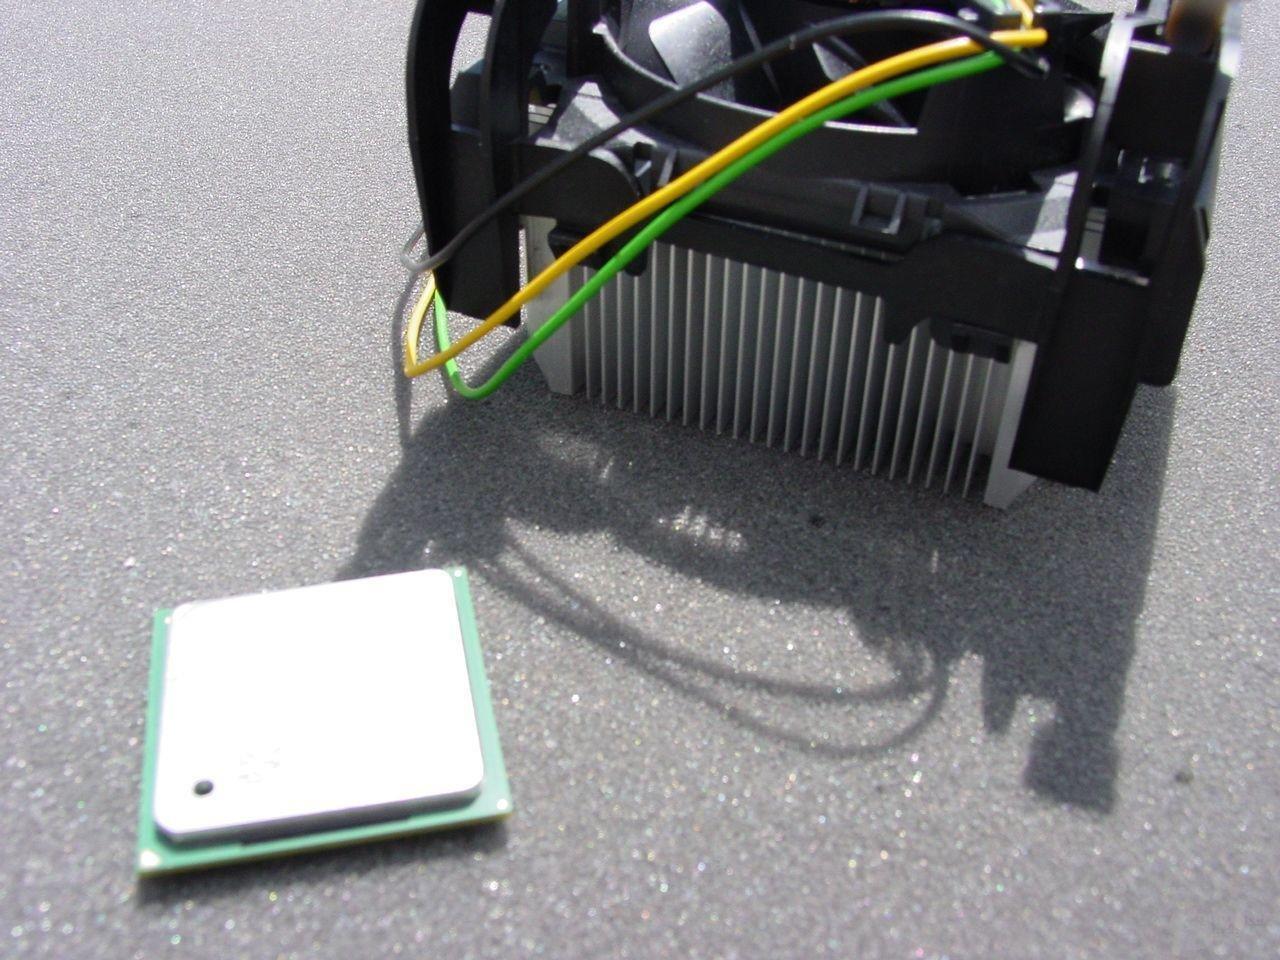 Intel Pentium 4 3,2 GHz mit neuem Boxed-Kühler